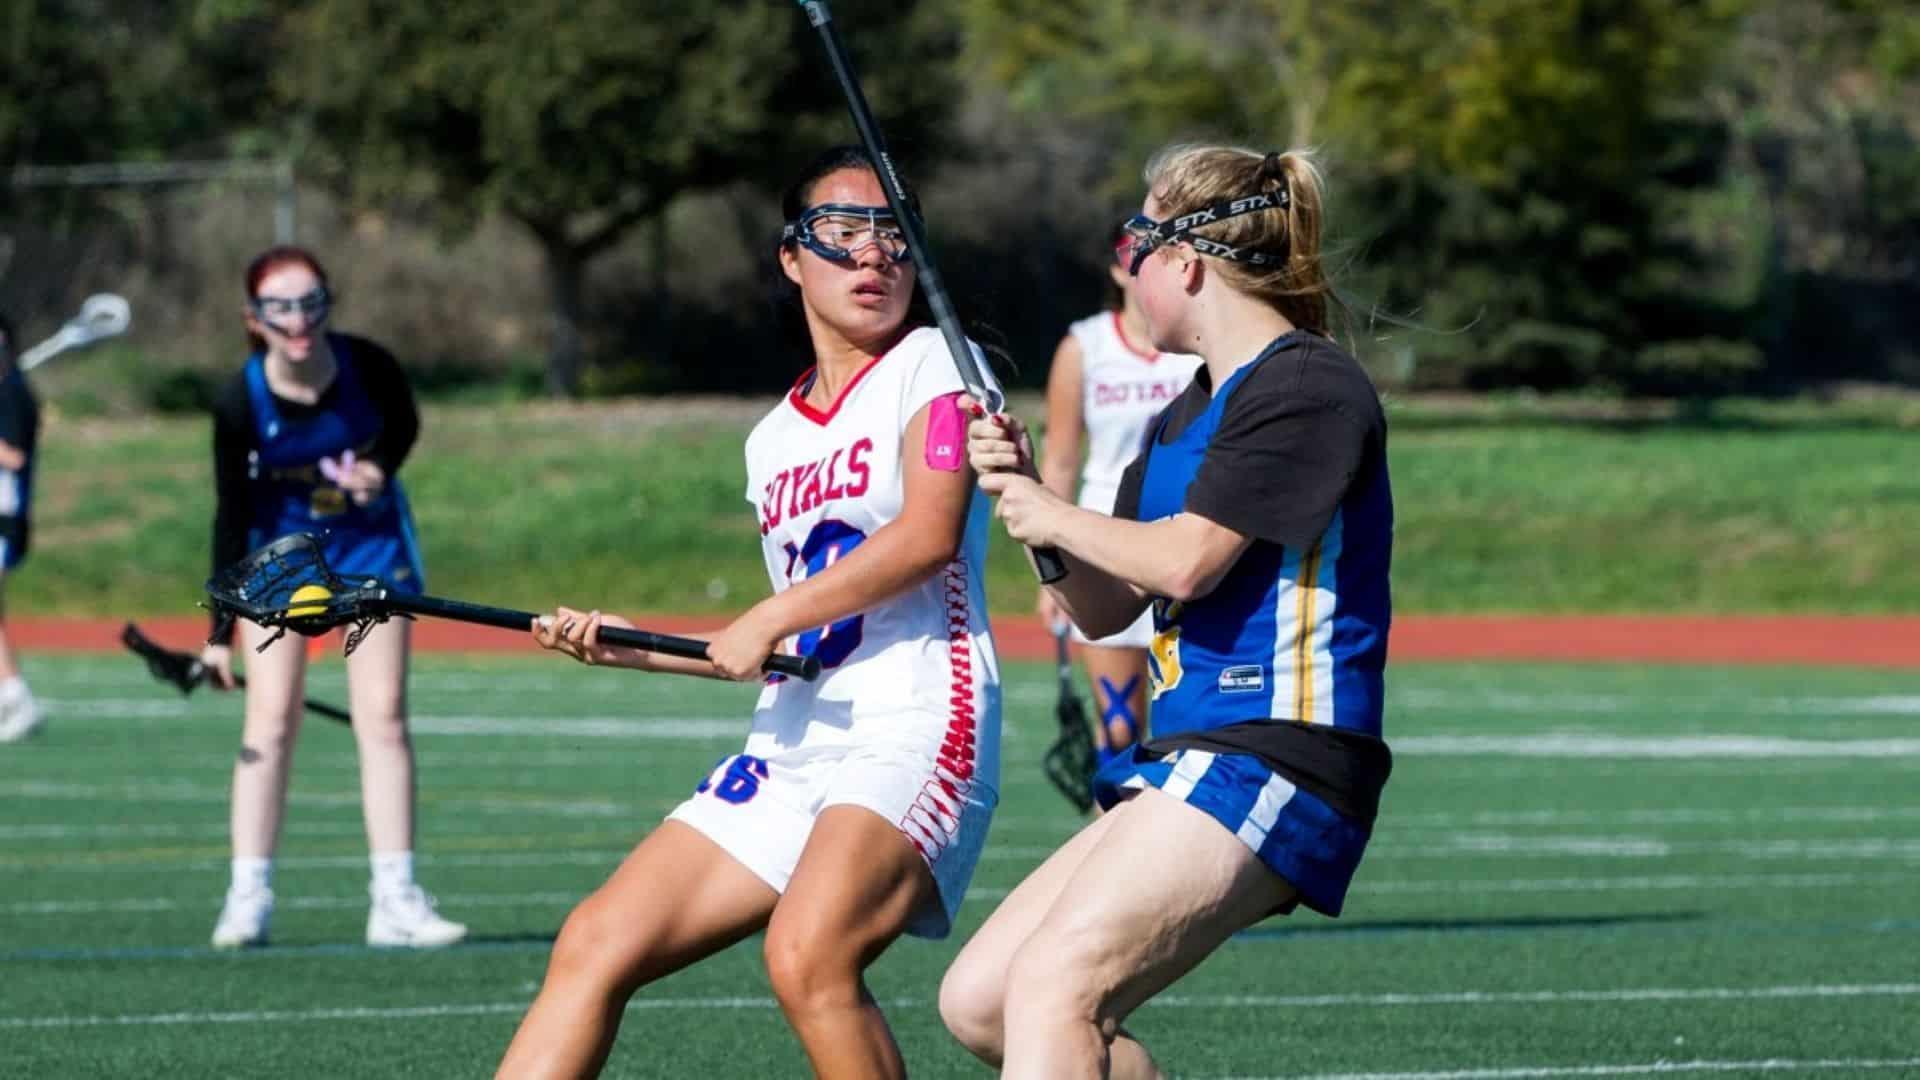 Aubrey Sturgeon, San Marcos Girls Lacrosse